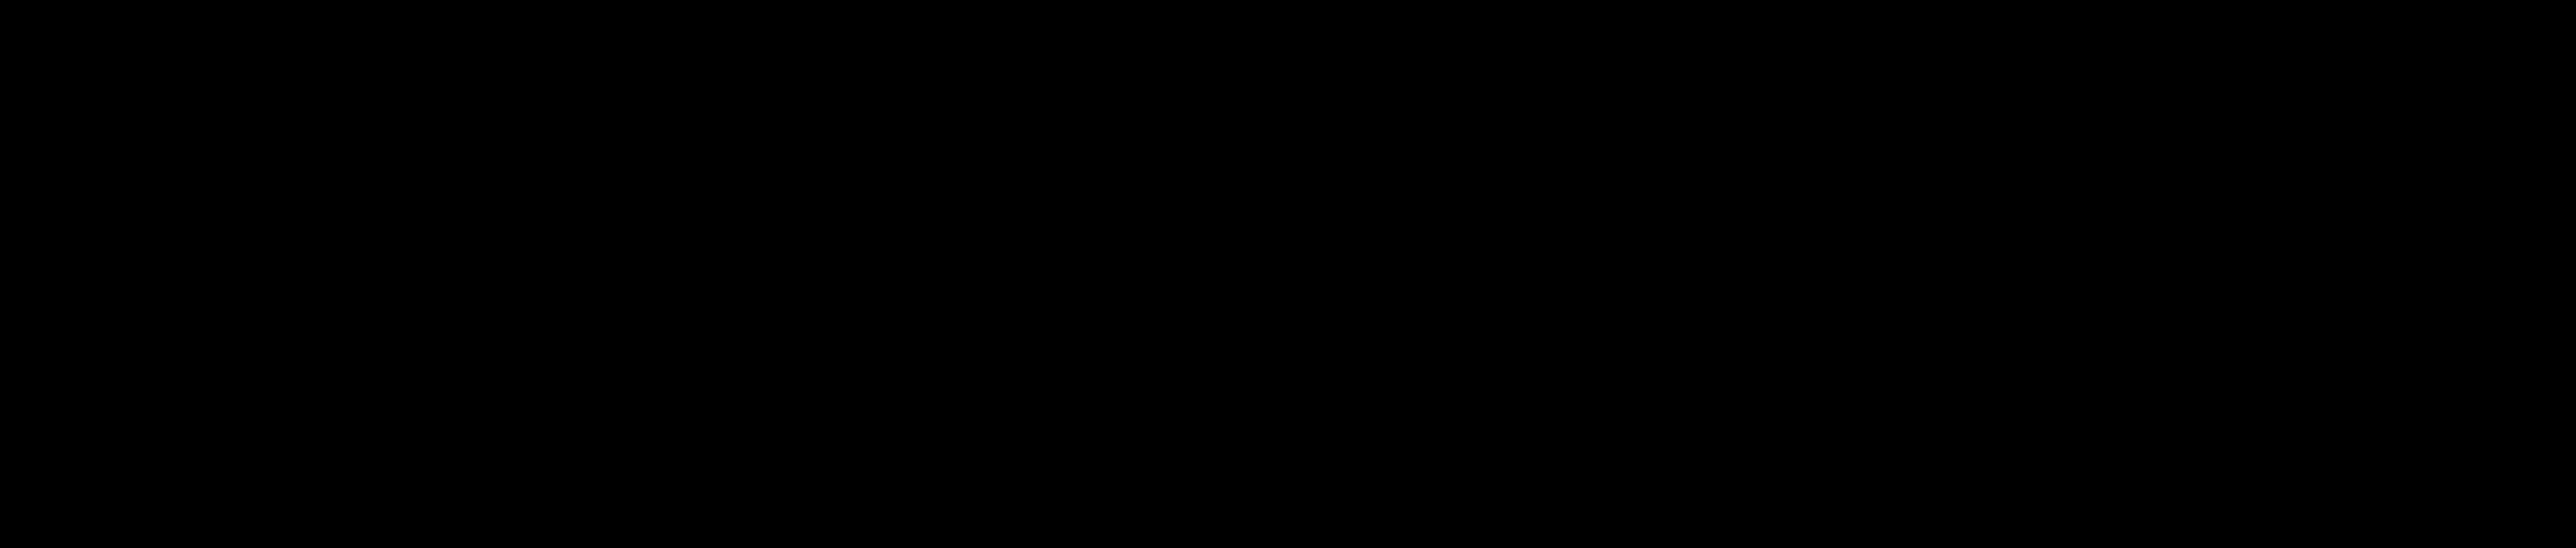 (E)-3-(3,4-Dimethoxy-d<sub>6</sub>-benzylidene)-7-(6-(1,2,3,4-tetrahydroacridin-9-ylamino)hexyloxy)chroman-4-one